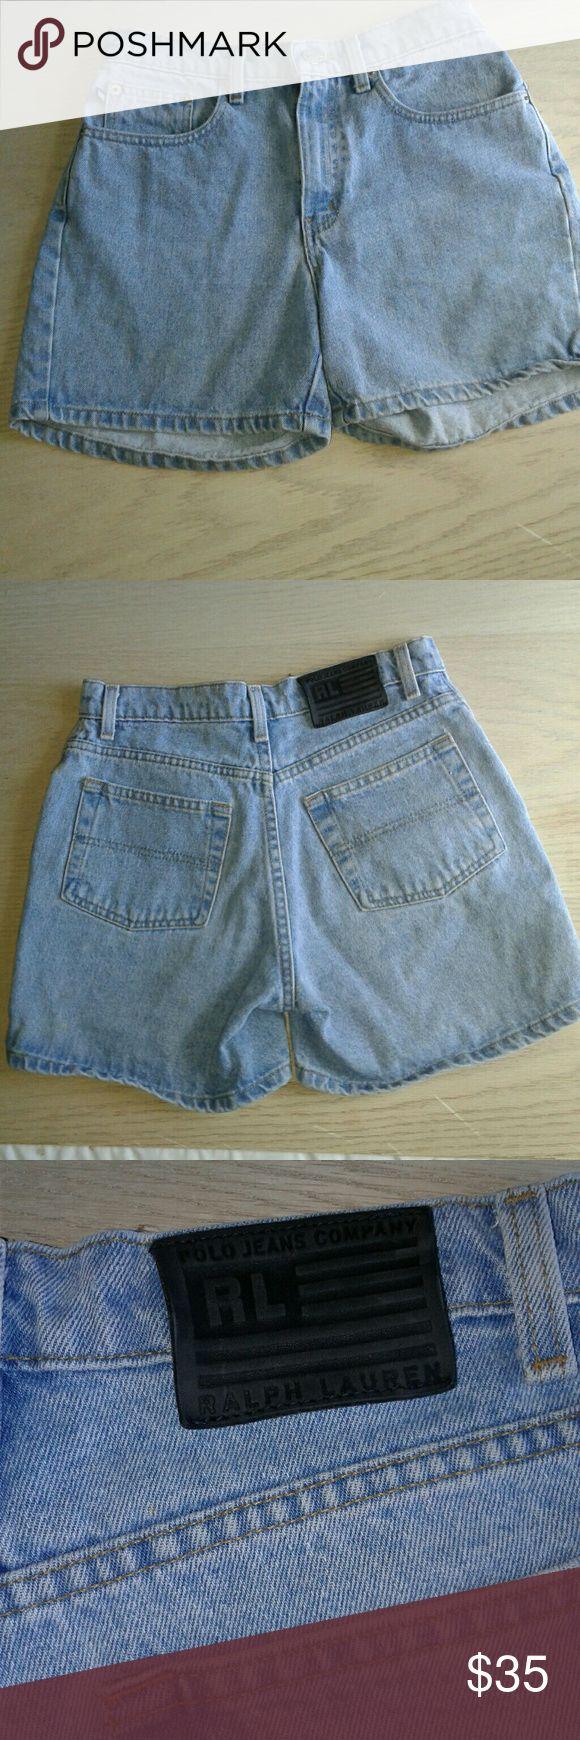 Vintage RL polo jean shorts high waist black label Vintage mom jeans High waisted  100% cotton  pockets  6 short Black label Polo by Ralph Lauren Jeans